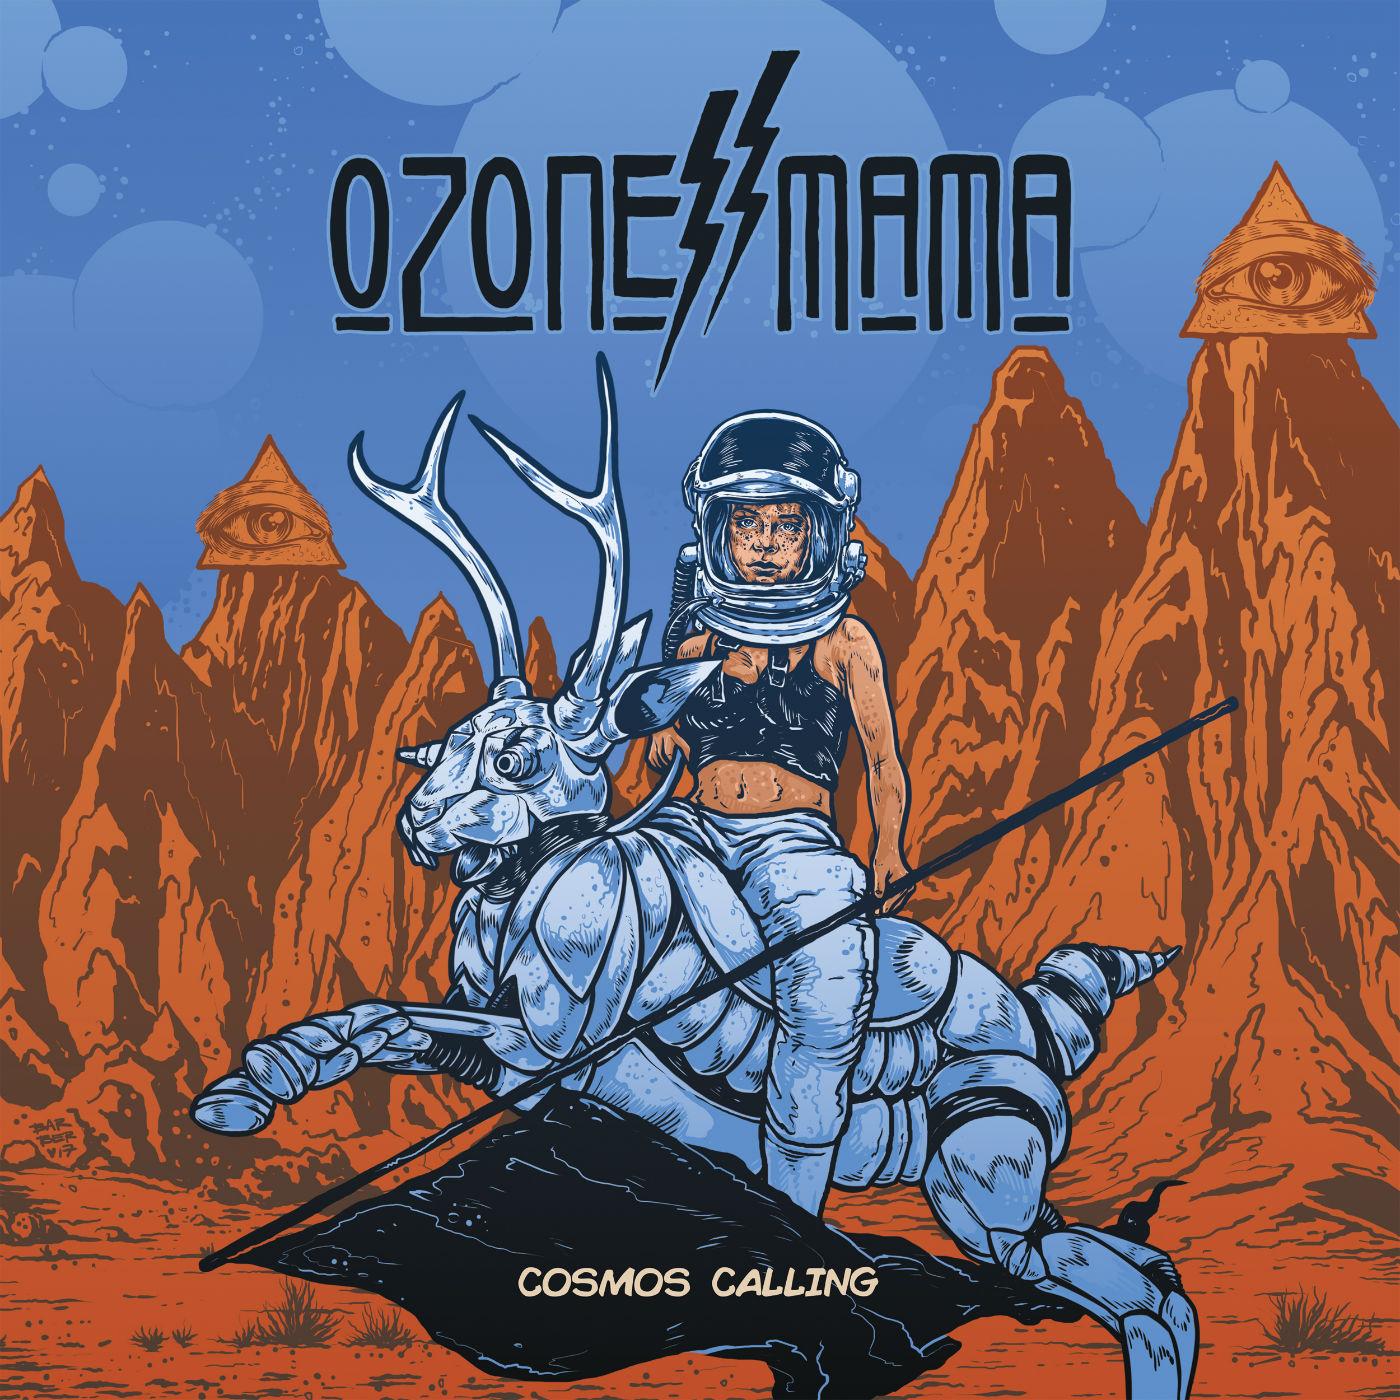 ozone mama cosmos calling